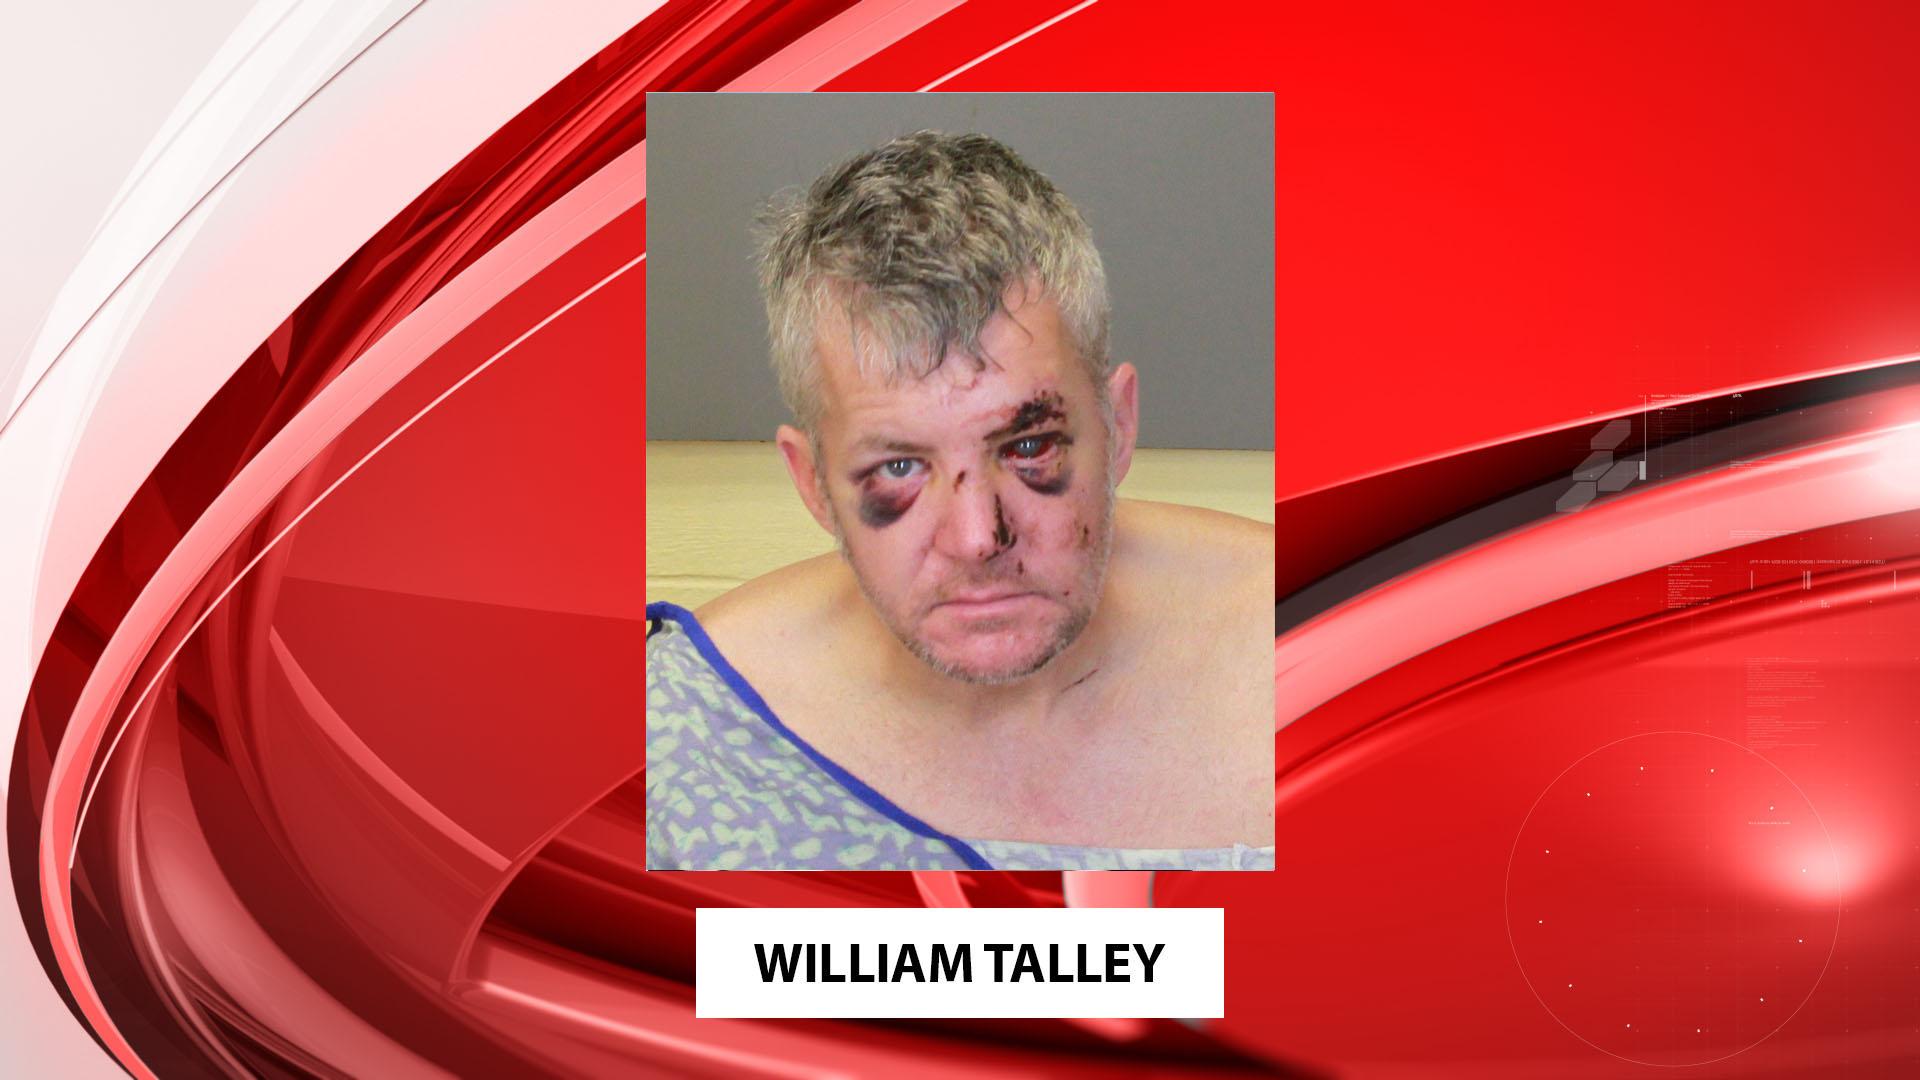 William Talley mugshot branded_1558041798131.jpg.jpg